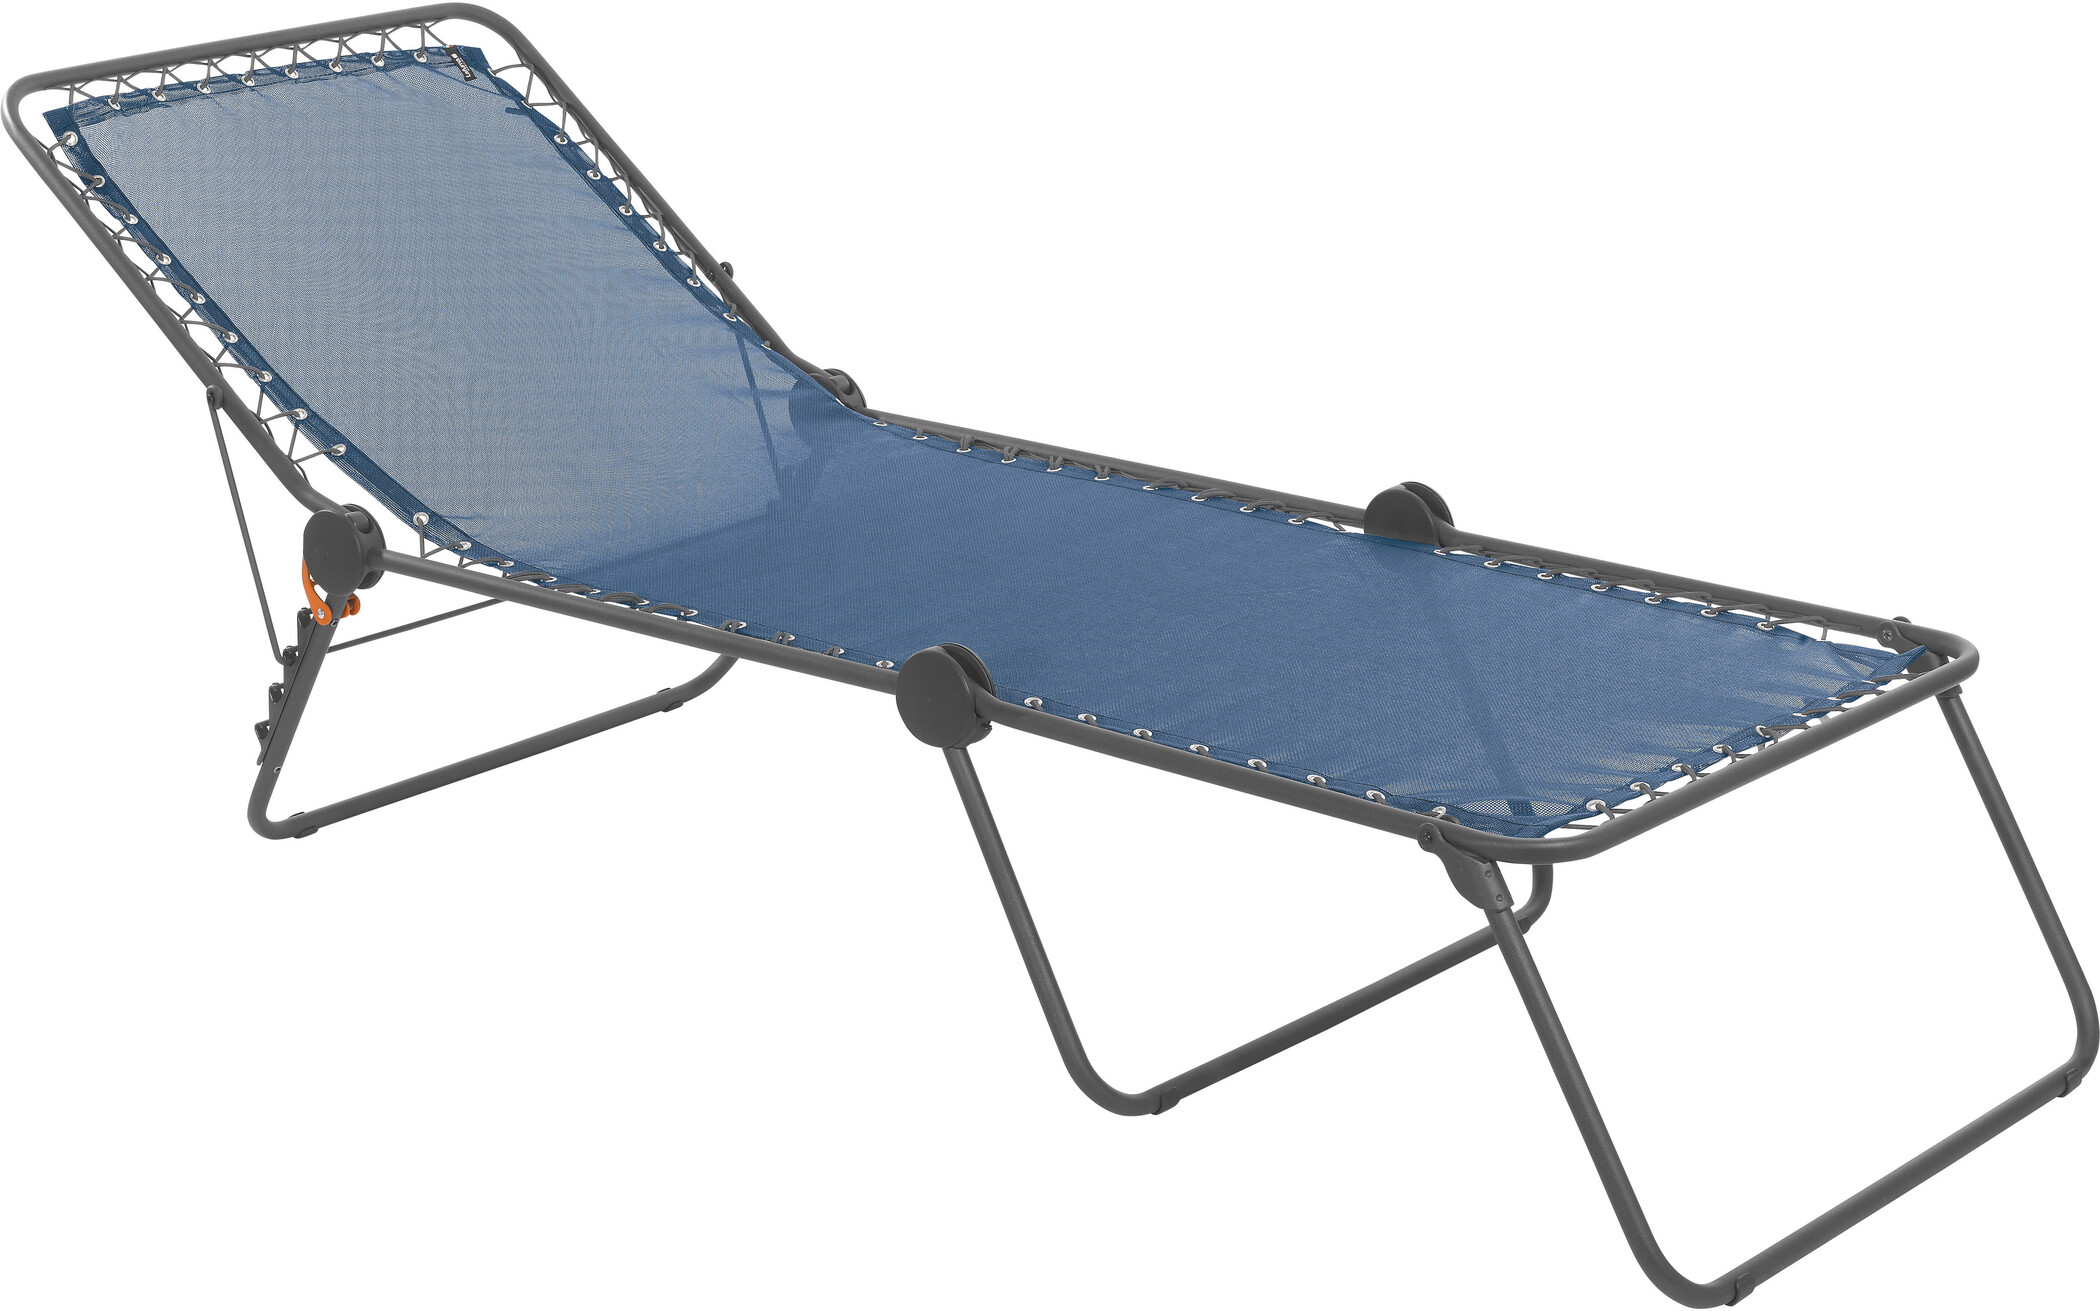 lafuma mobilier siesta l chaise longue avec cannage phifertex ocean